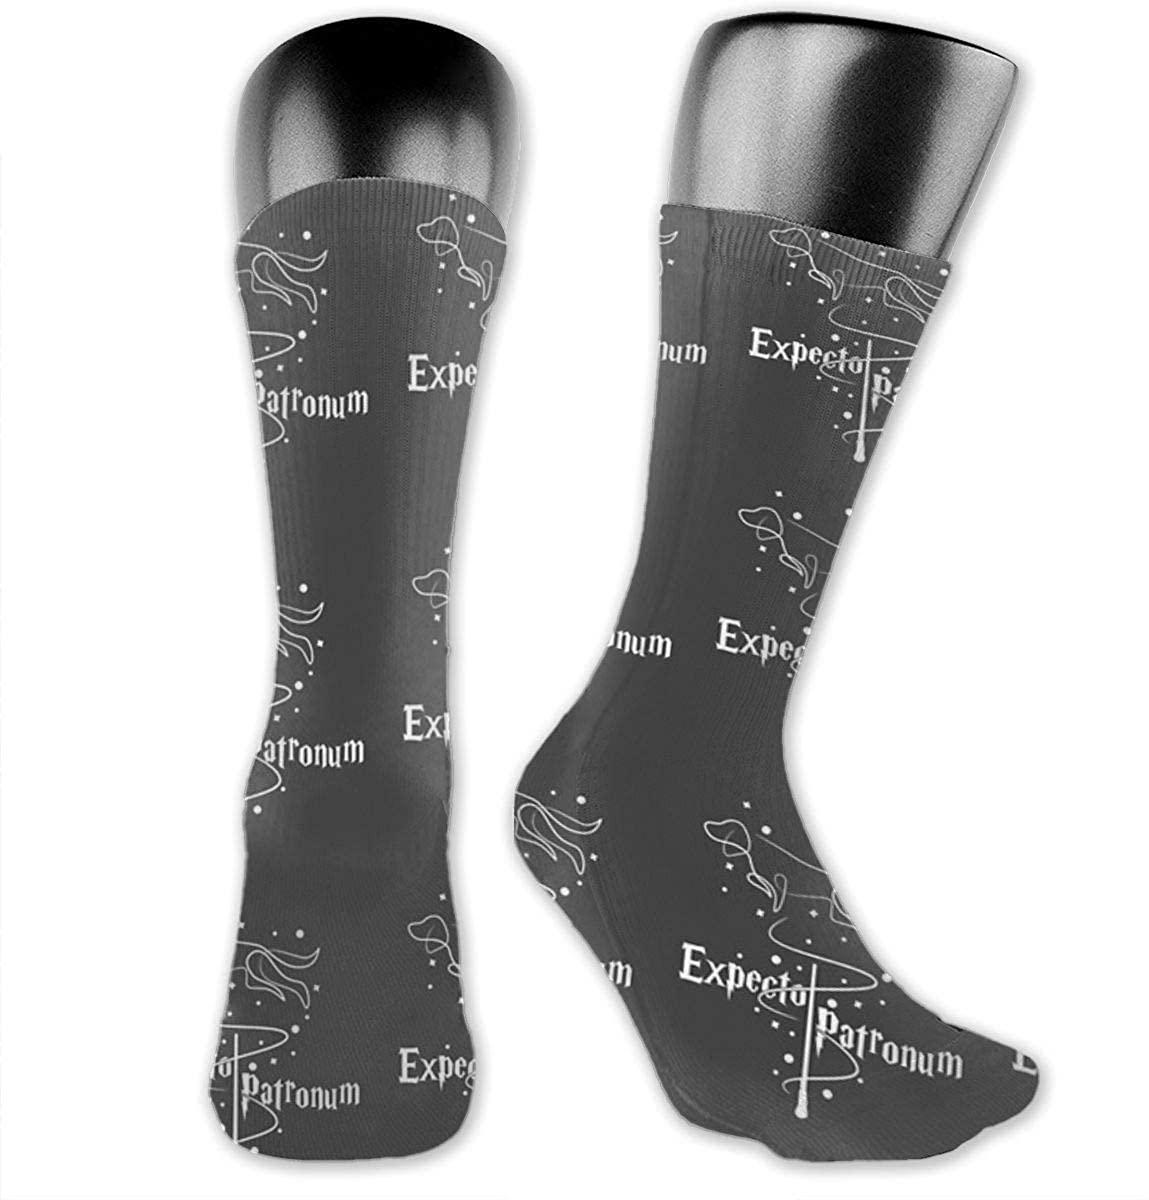 Unisex Crazy Funny Cool Expecto Patronum - Dog - Ron Socks Colorful Athletic Medica Socks Novelty Casual Crew Socks